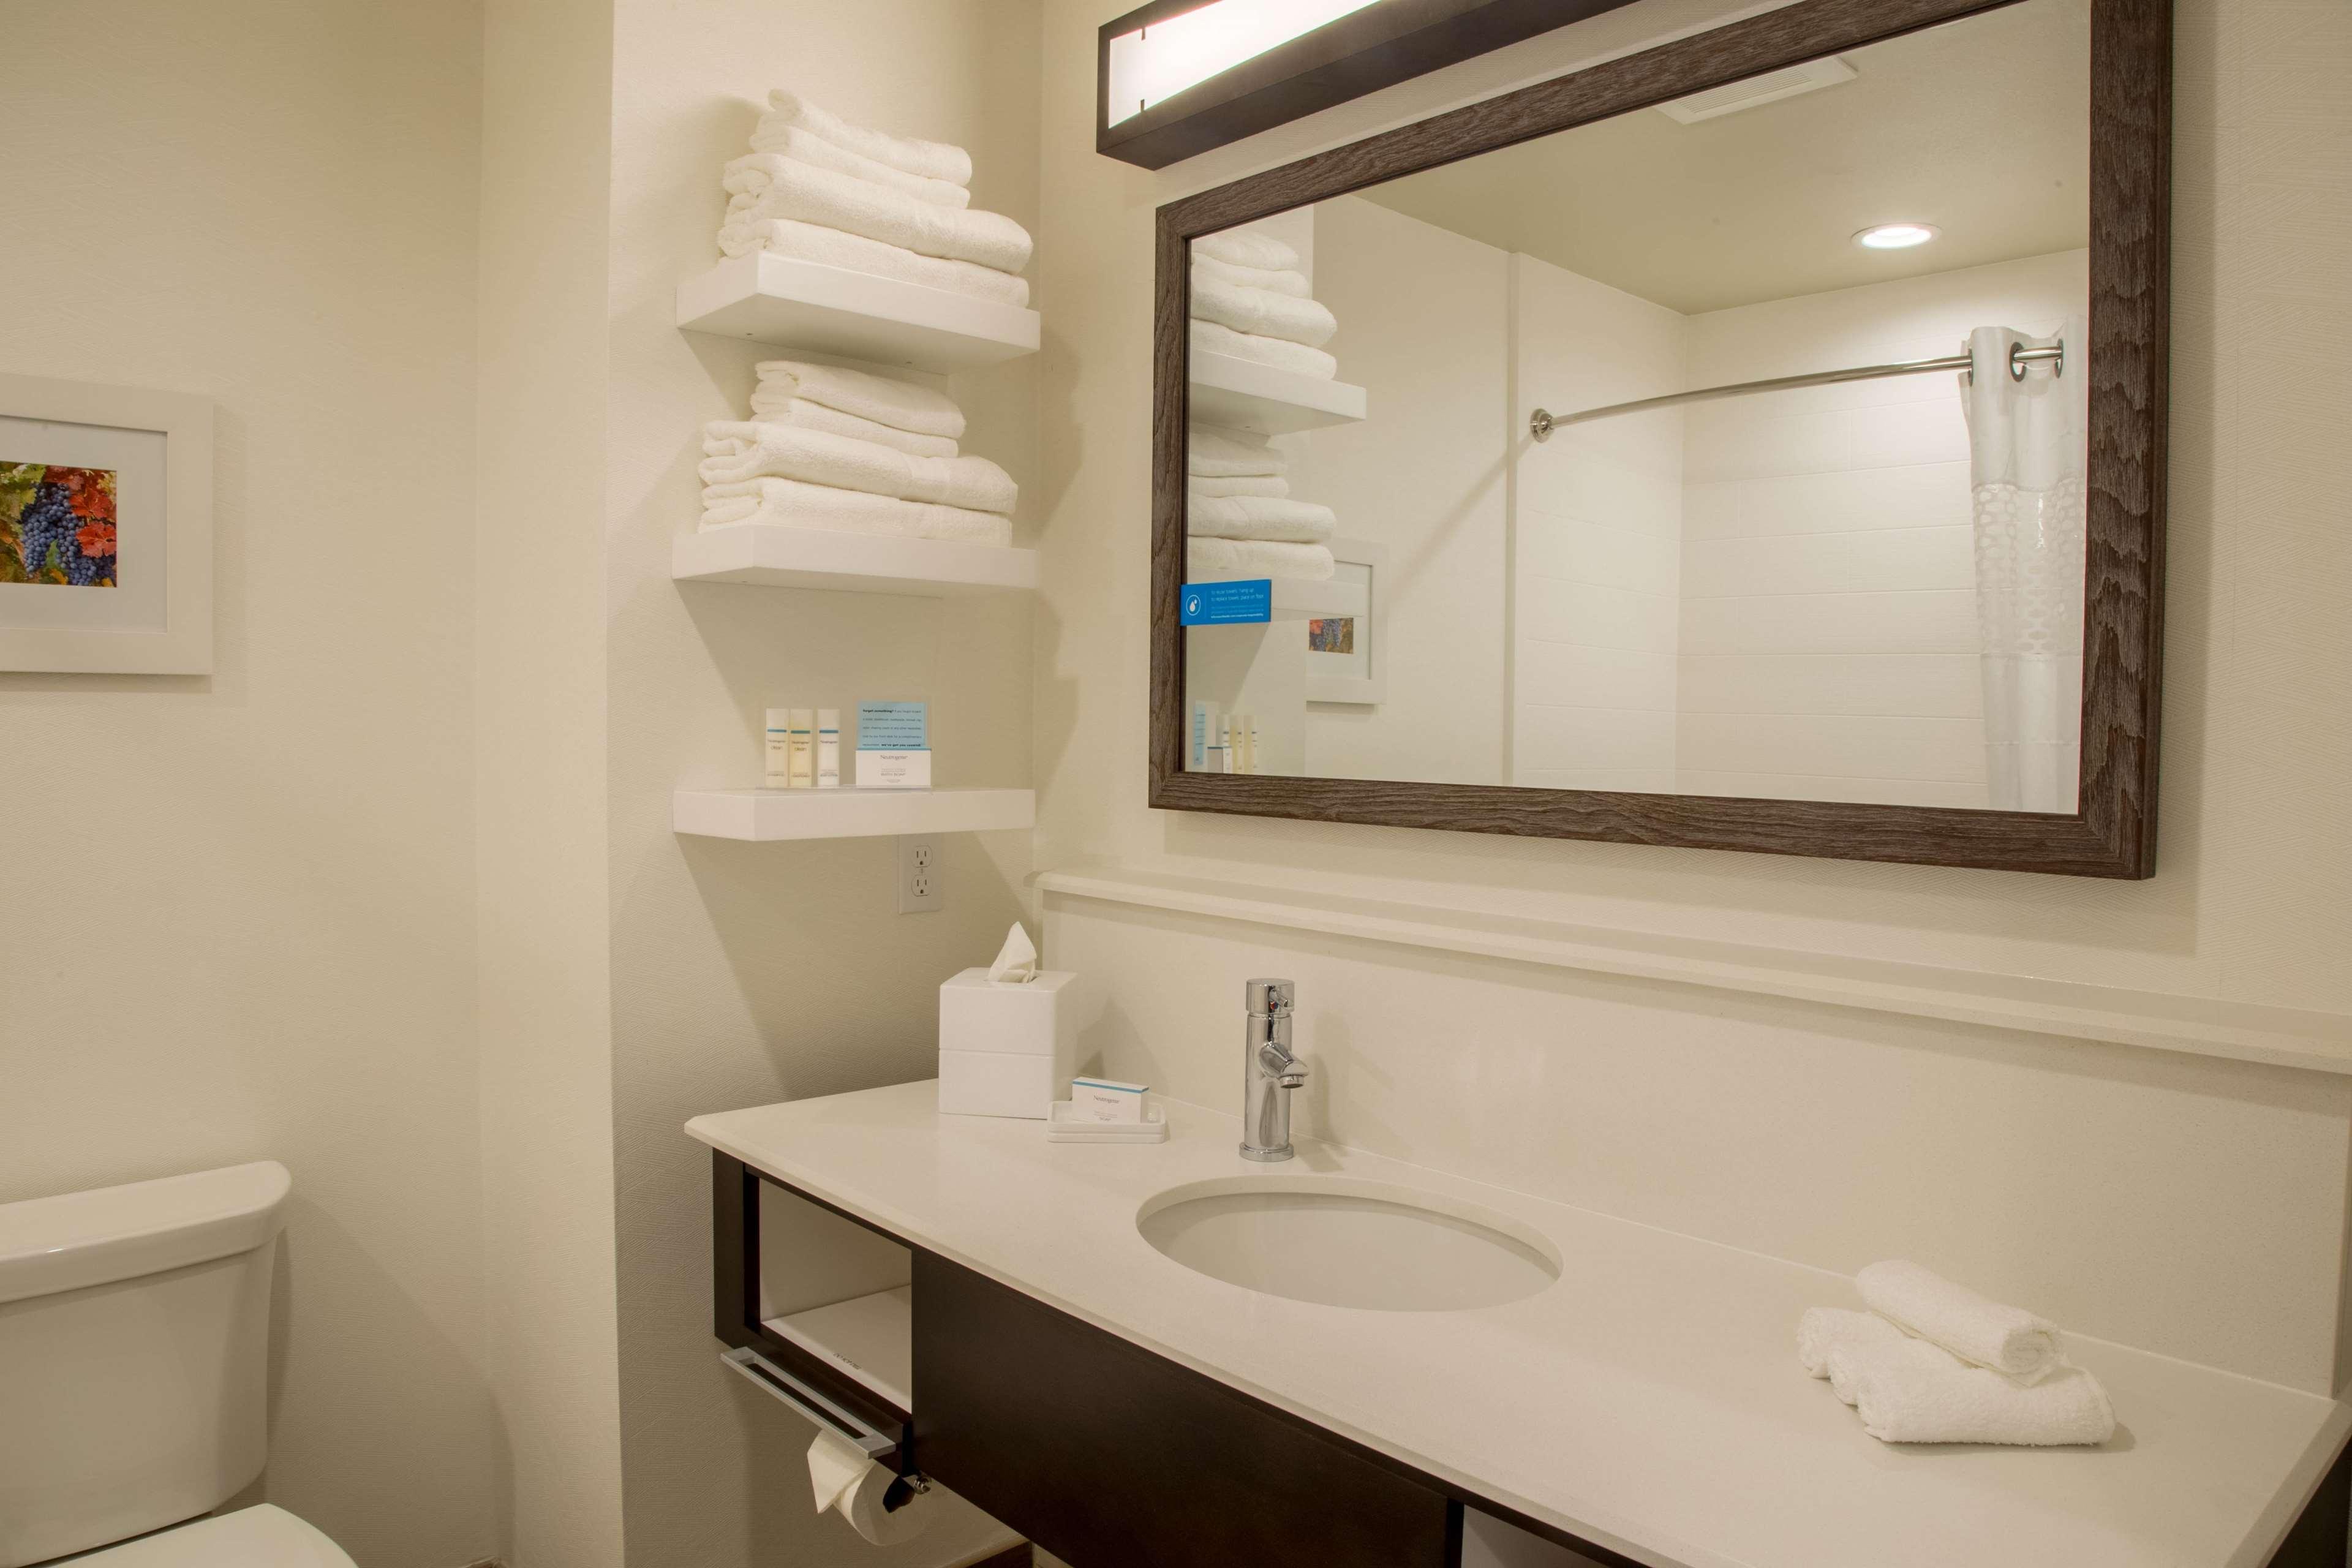 Hampton Inn & Suites Murrieta Temecula image 15